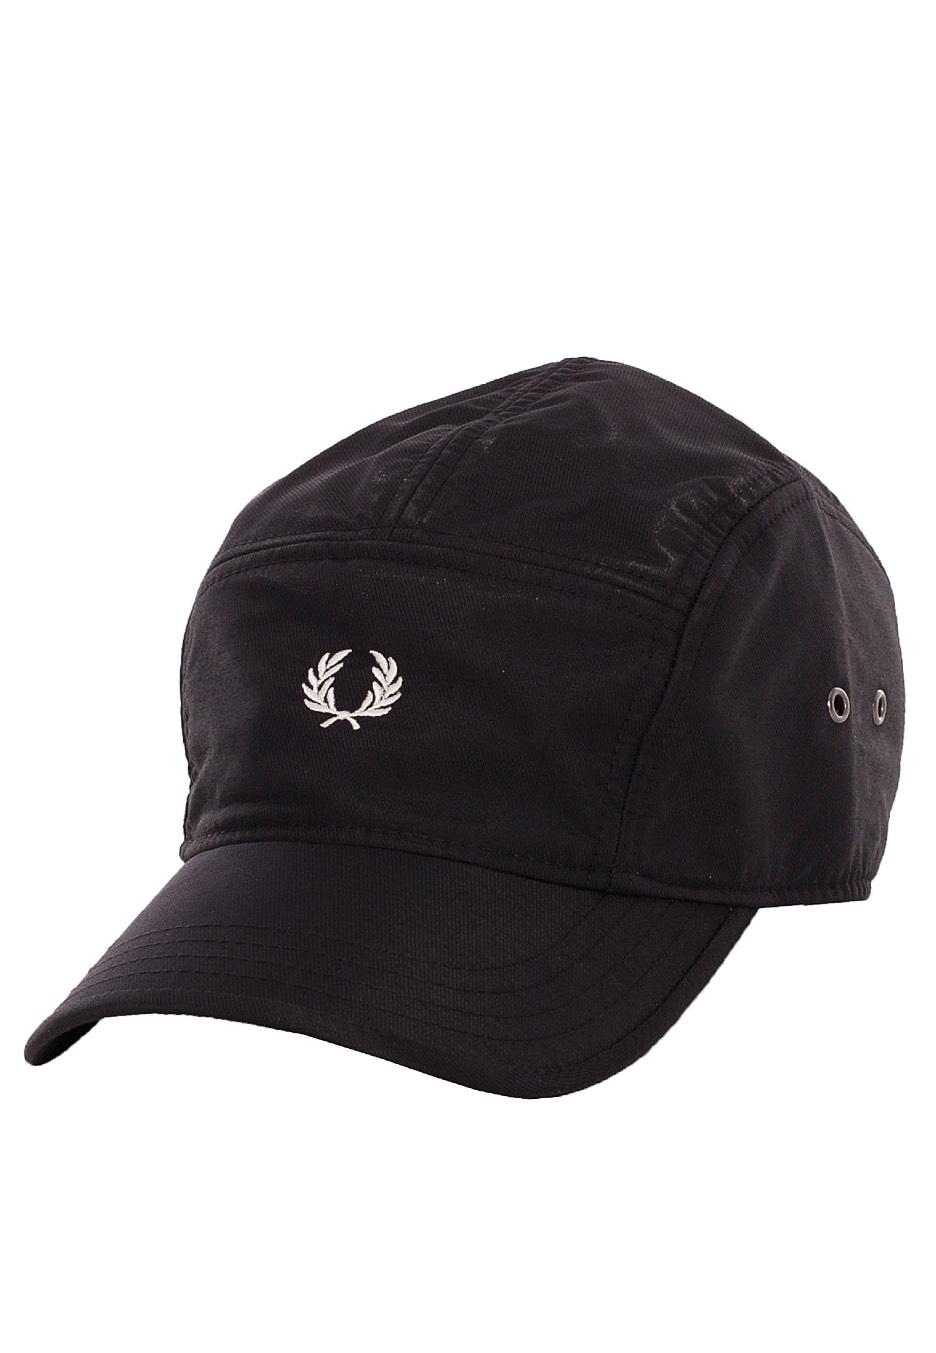 Fred Perry - Nylon Black - Cap - Streetwear Shop - Impericon.com AU 34c992ac513